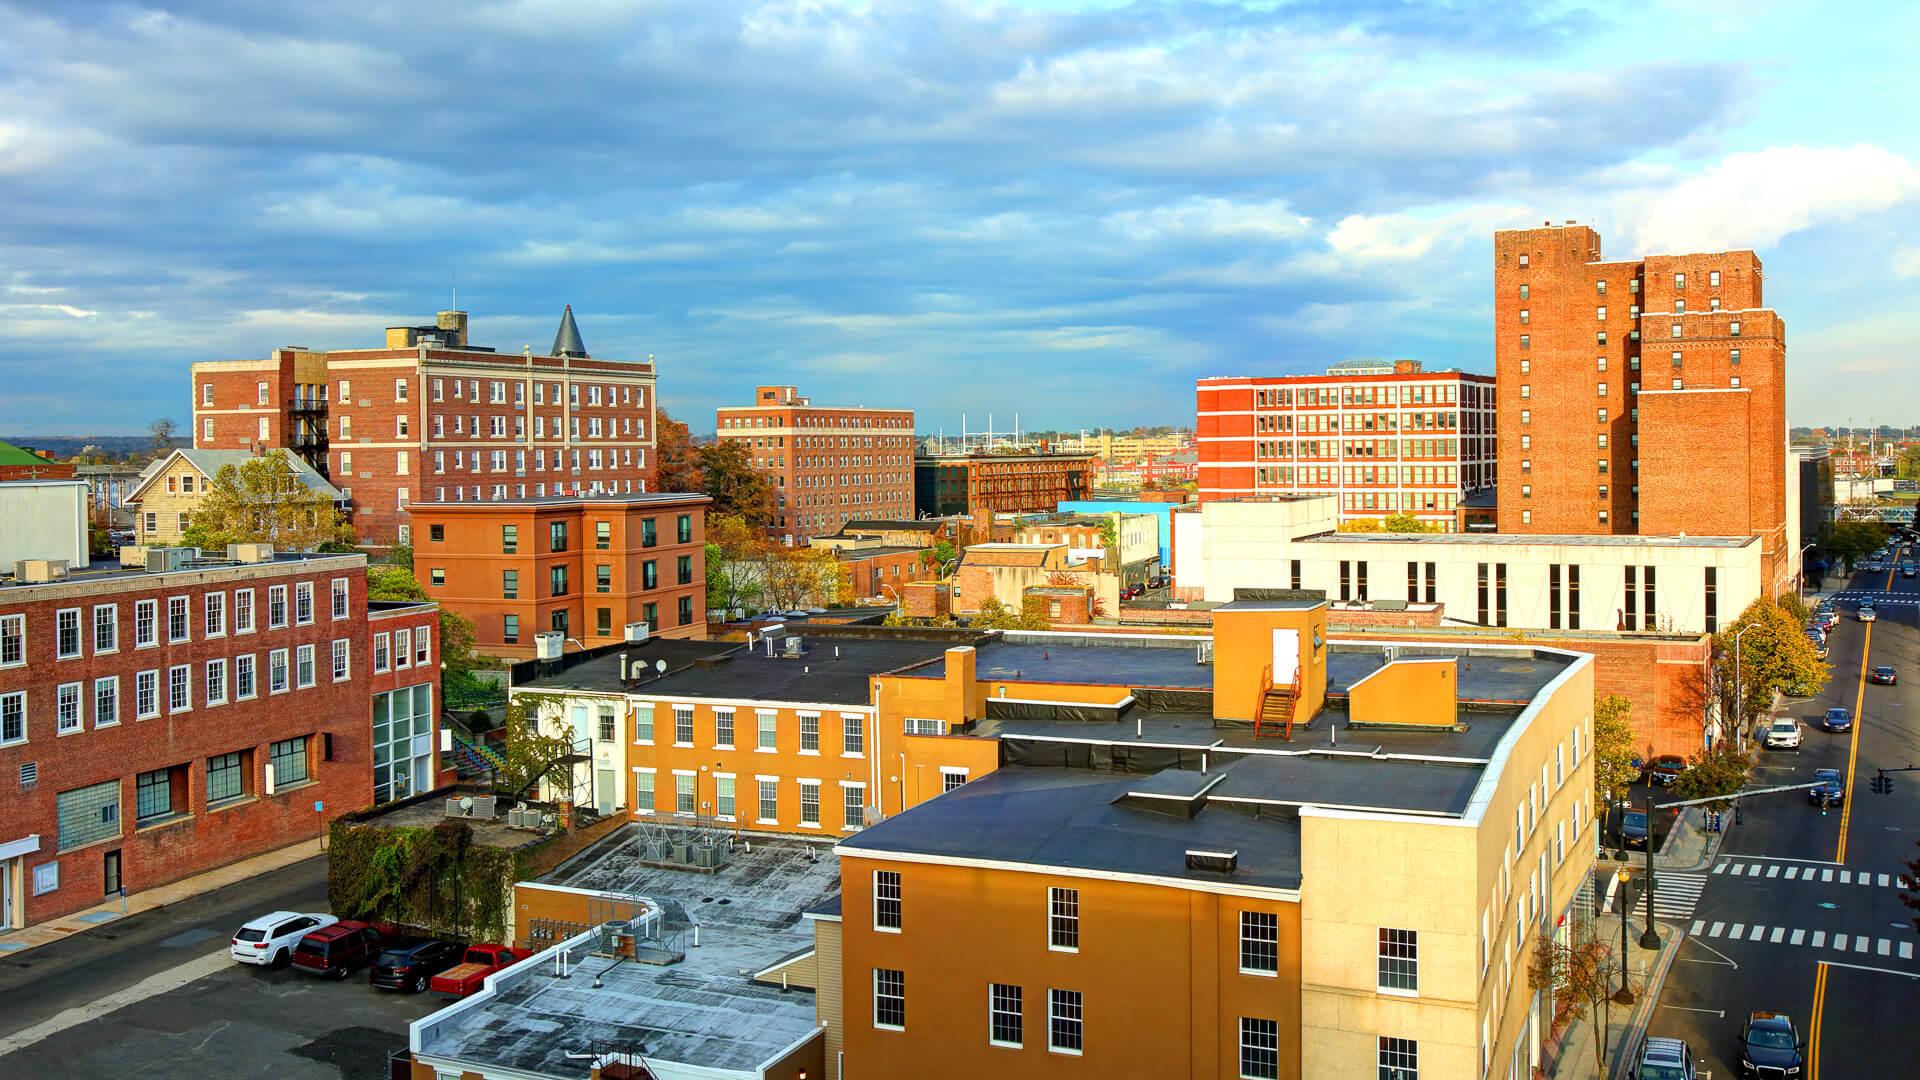 Bridgeport is a historic seaport city in the U.